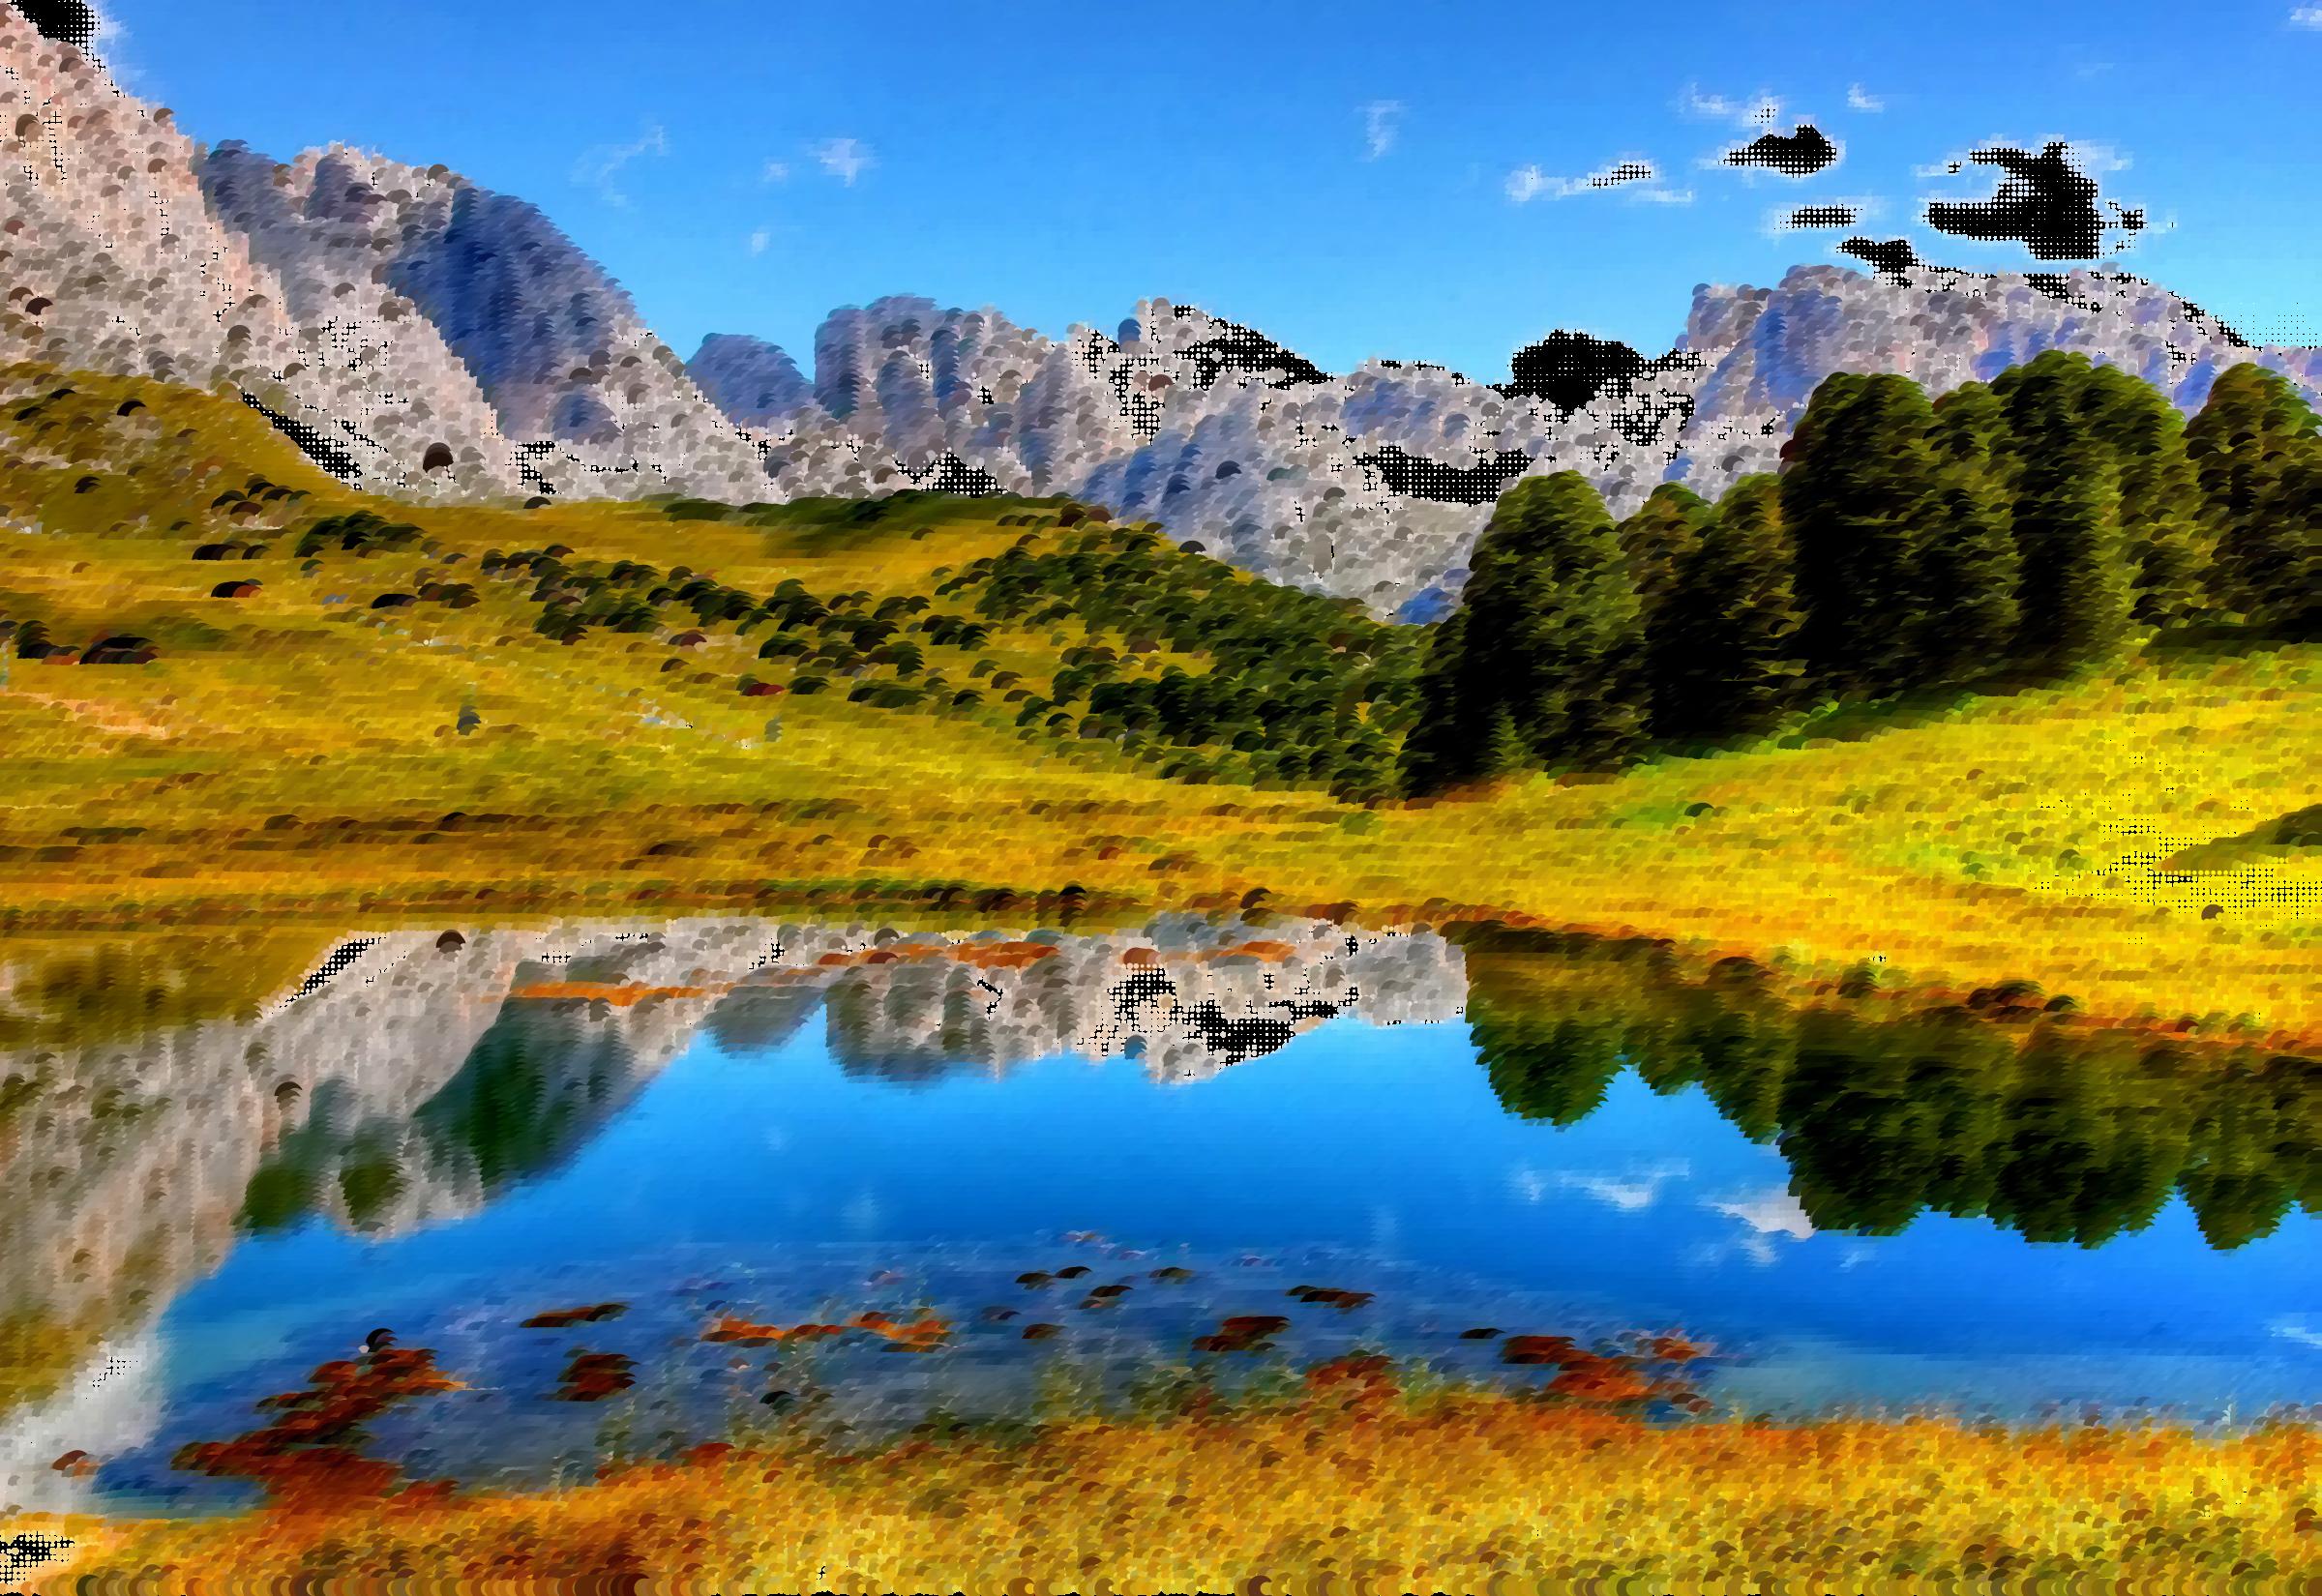 Surreal italian alps big. Clipart lake mountan